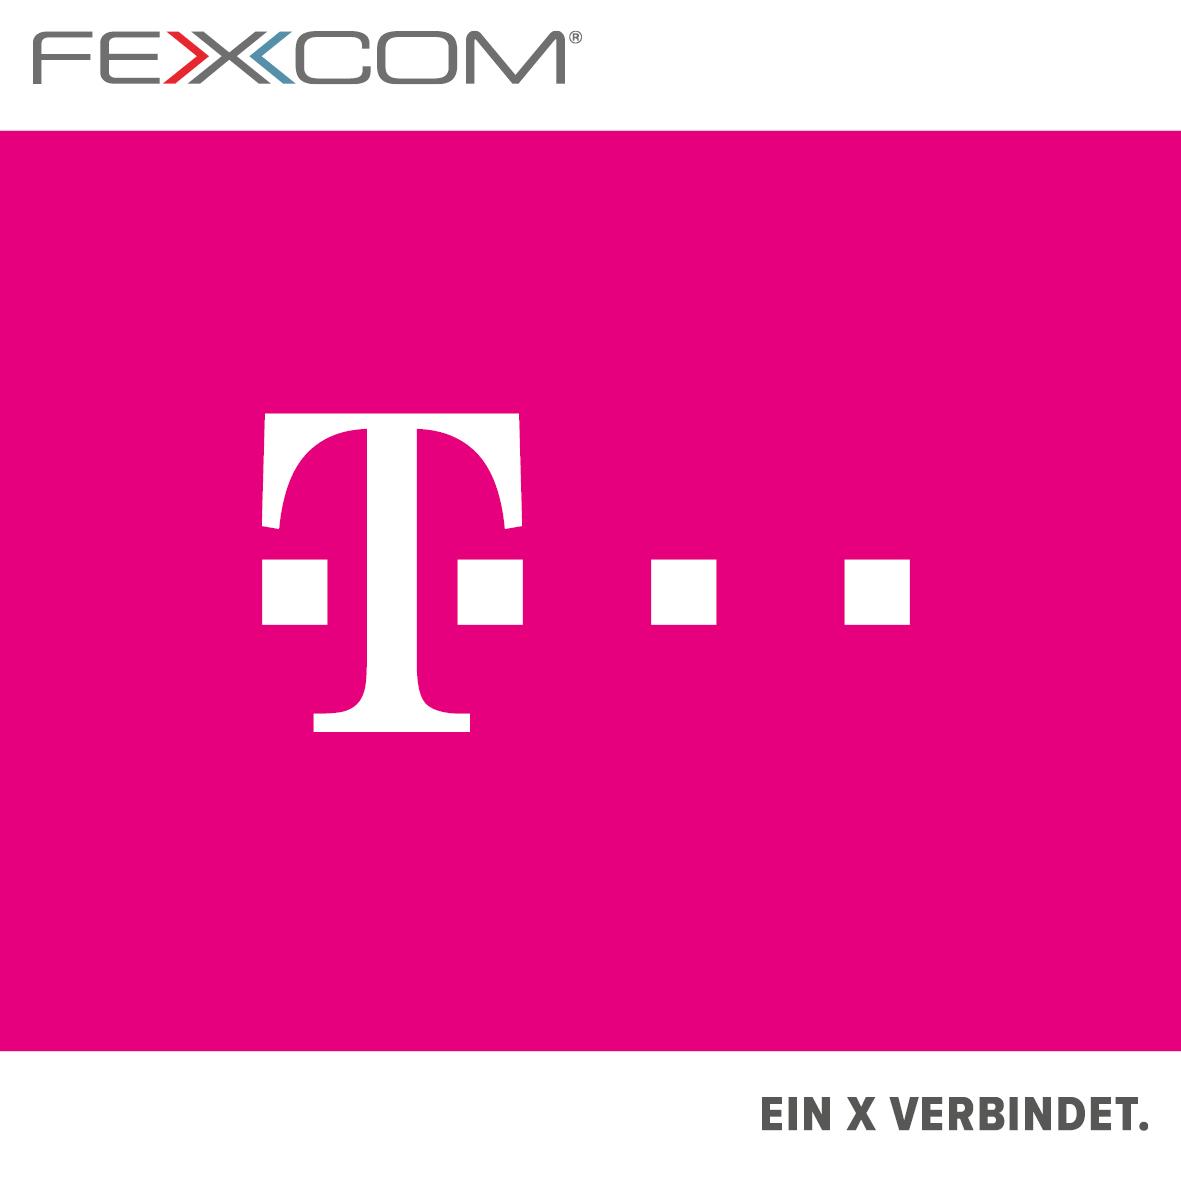 Telekom Partner FEXCOM Berlin Eastside Mall